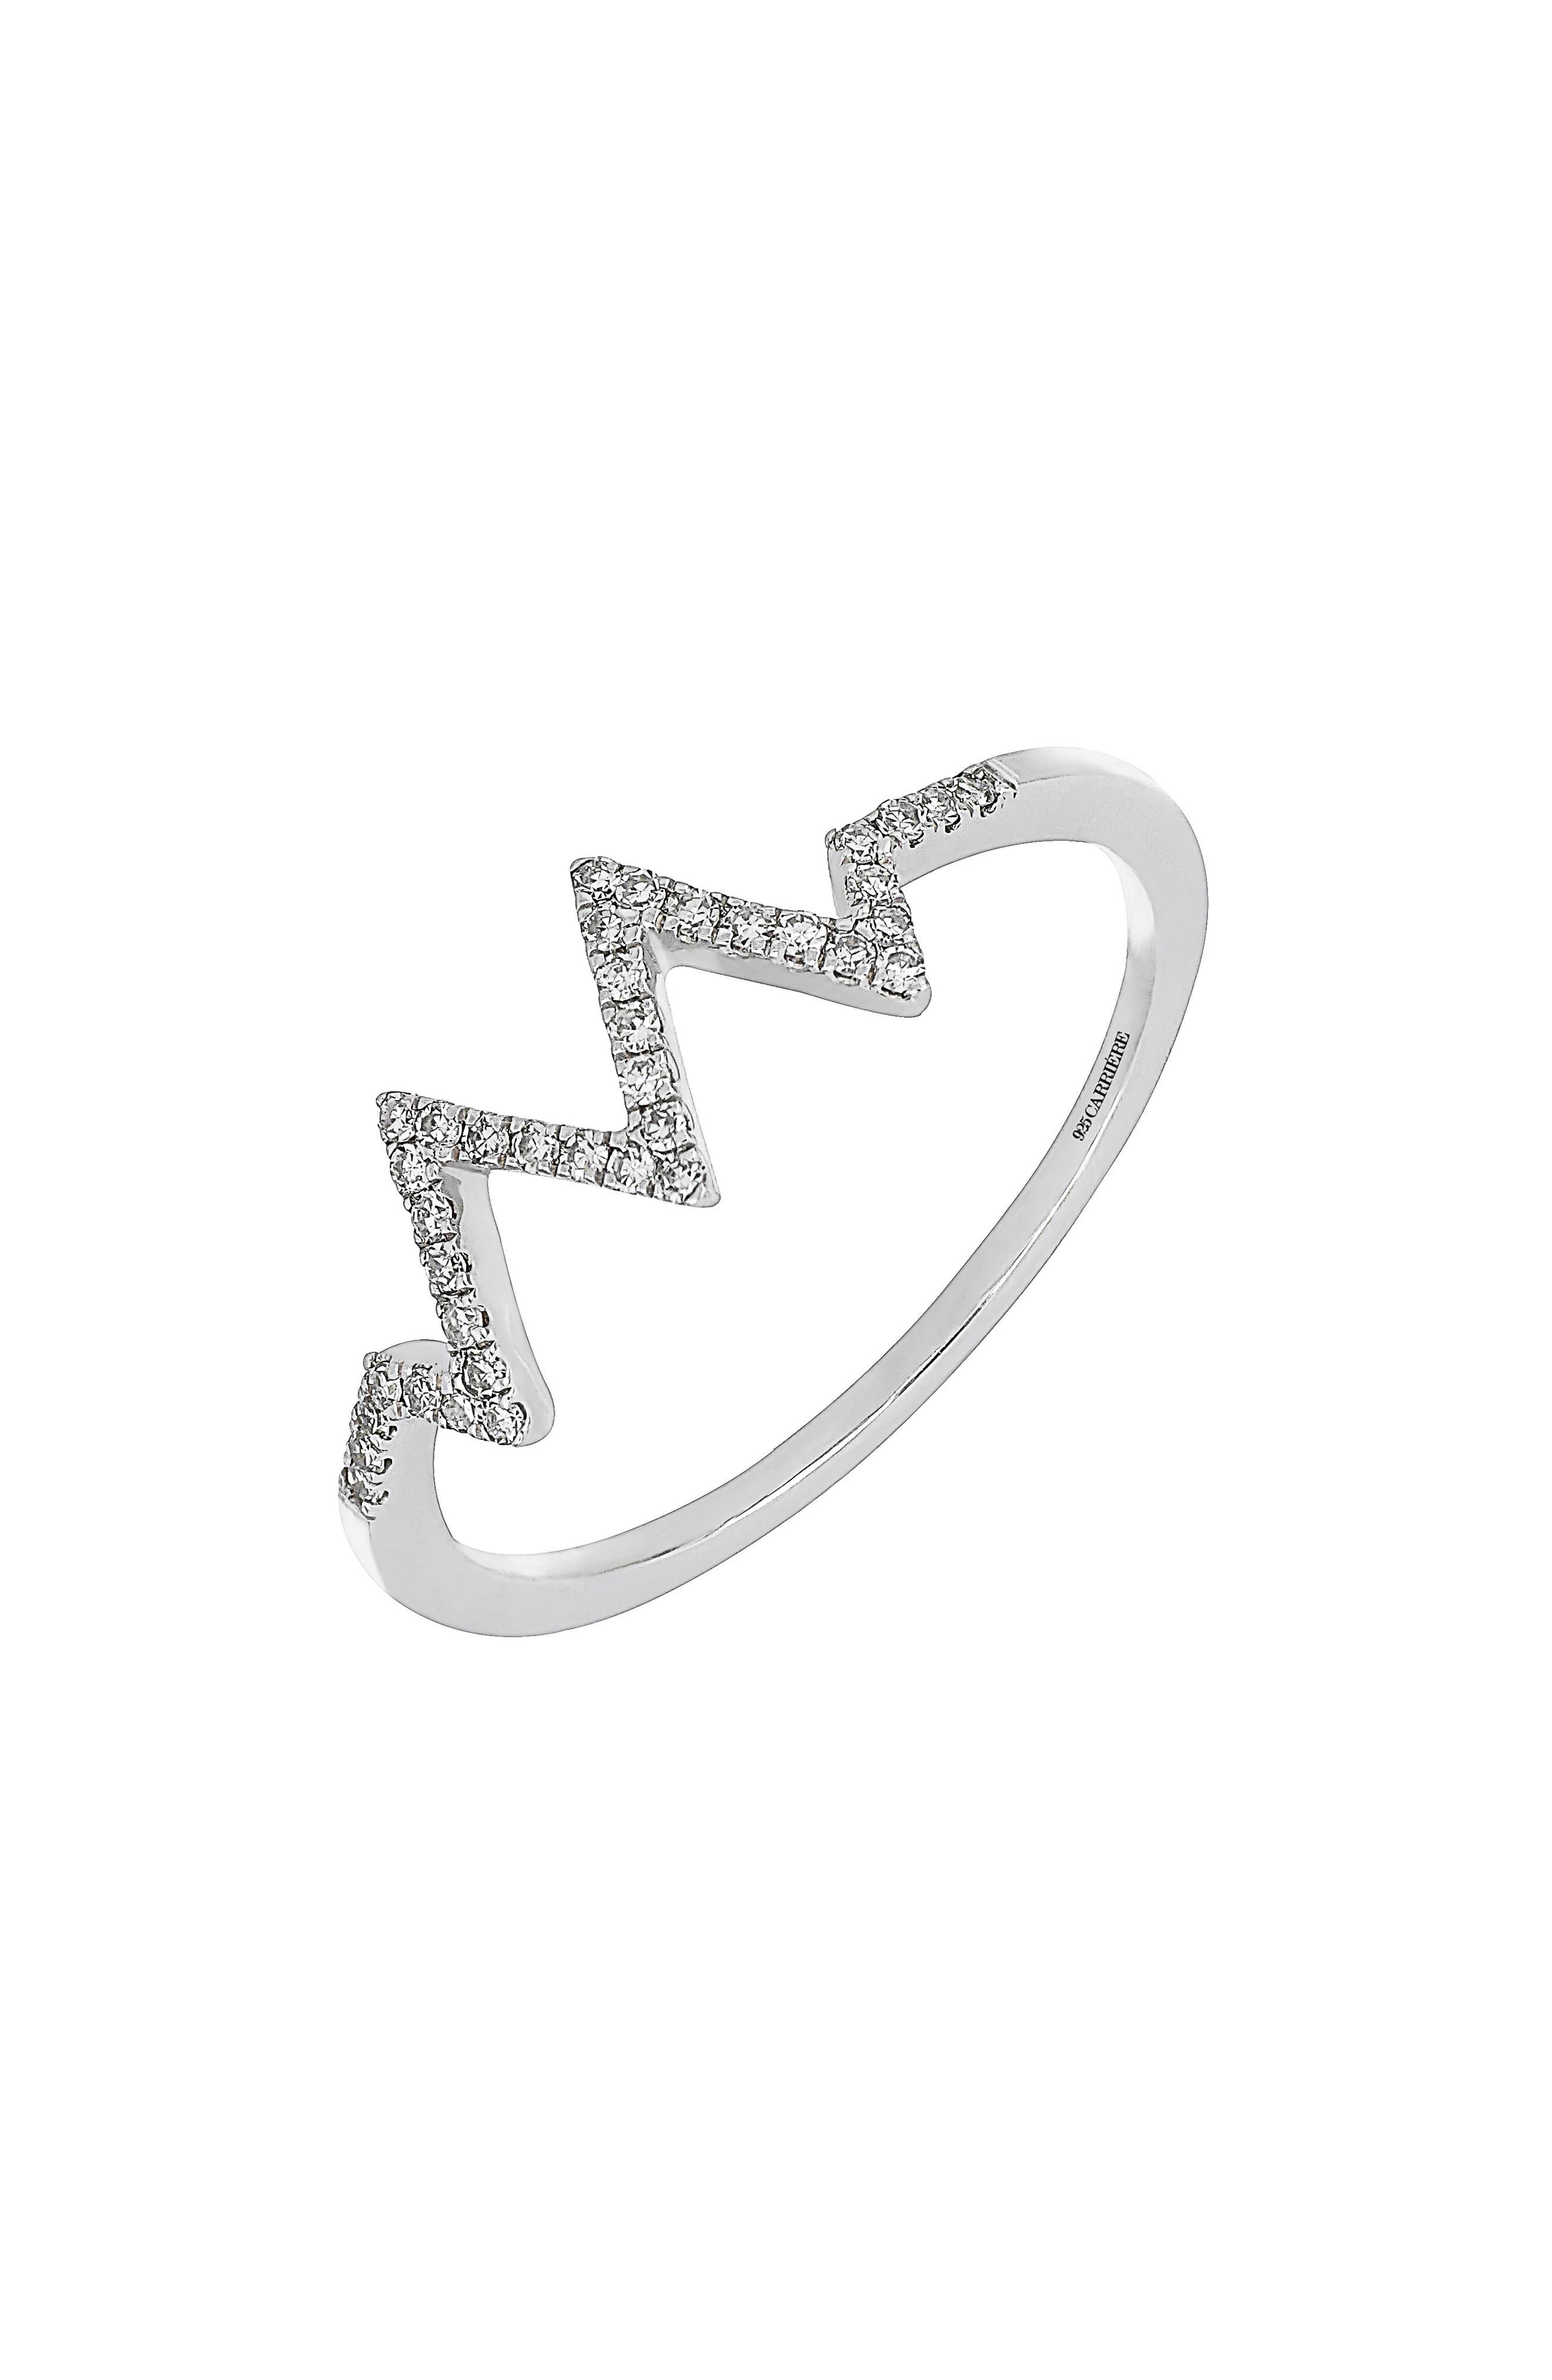 Carrière Zigzag Diamond Ring,                         Main,                         color,